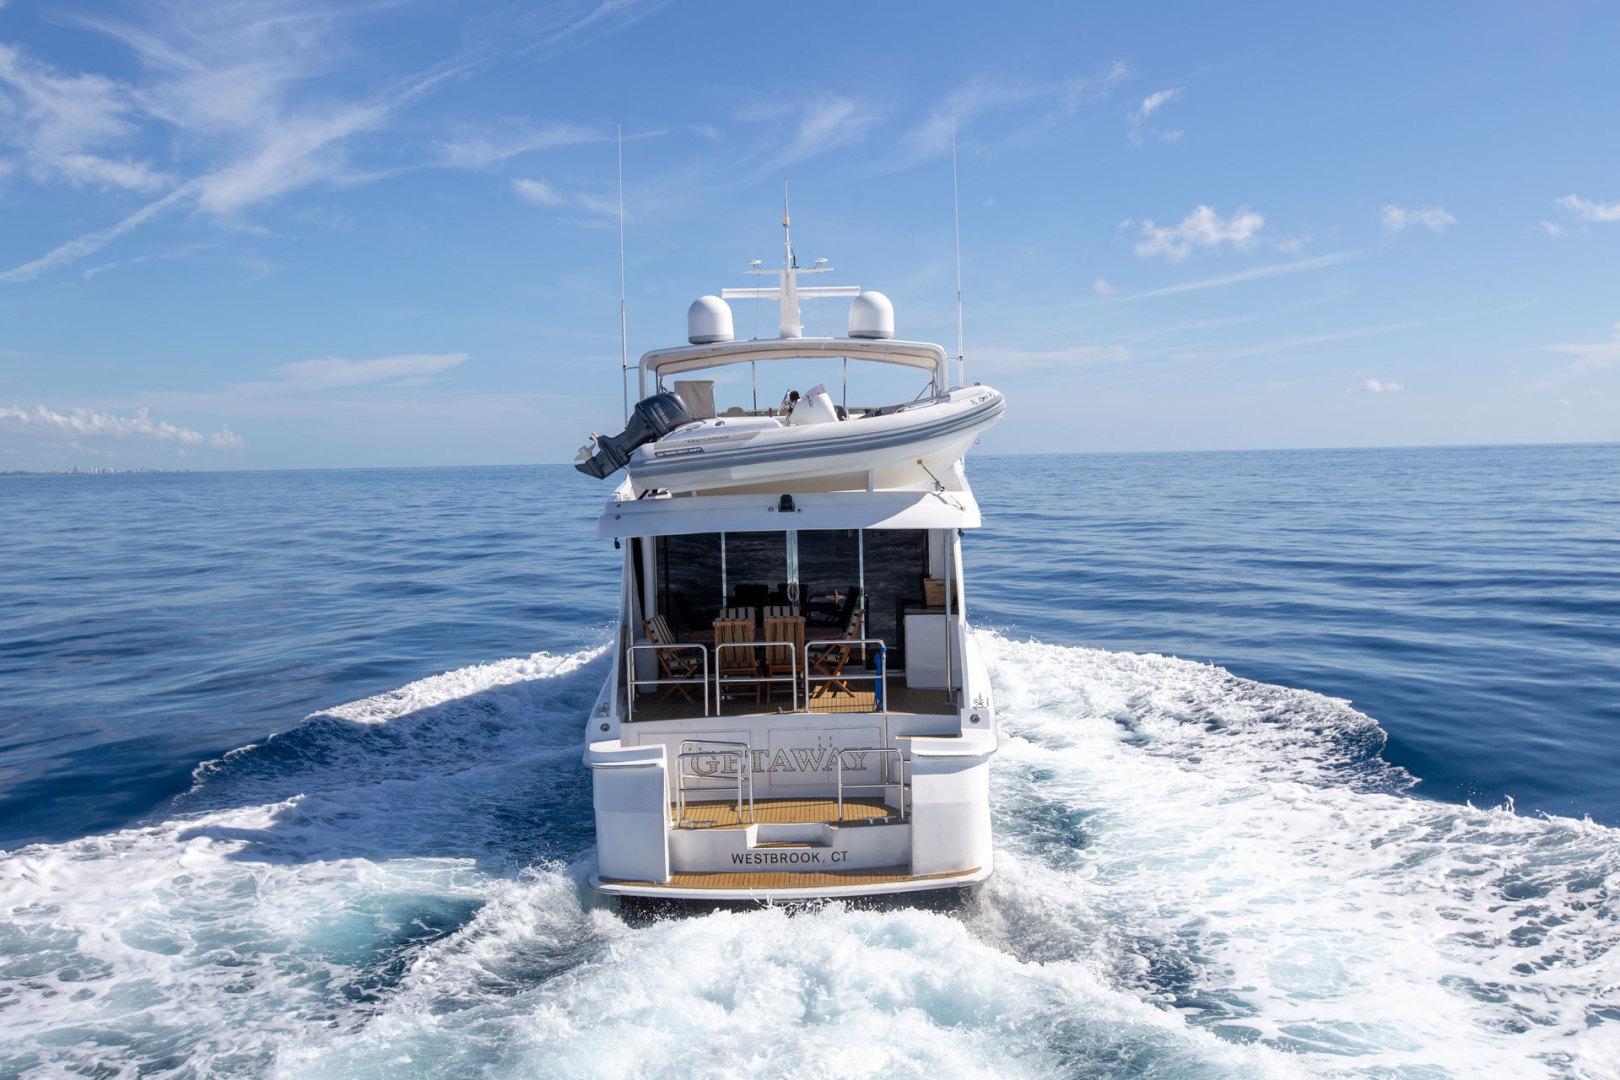 Hatteras-Cockpit Motor Yacht 2000-Getaway Ft. Lauderdale-Florida-United States-1417500 | Thumbnail